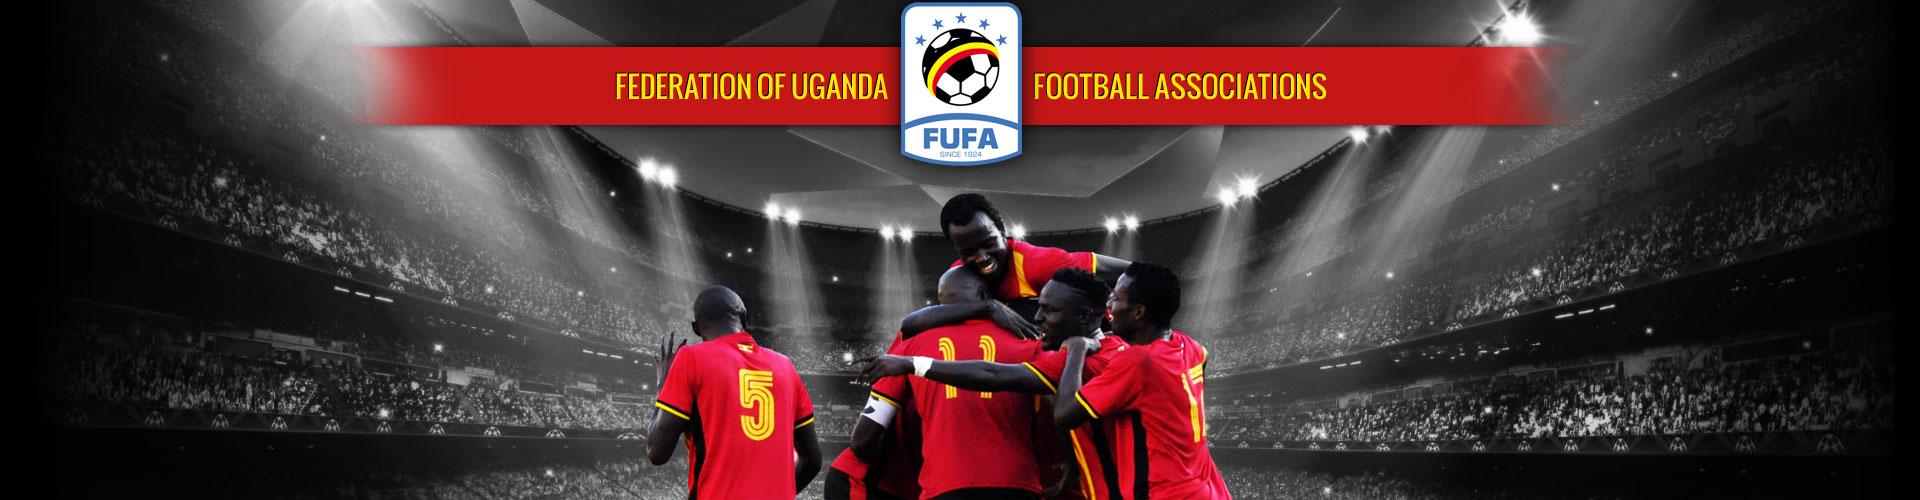 StarTimes Uganda Premier League - FUFA: Federation of Uganda